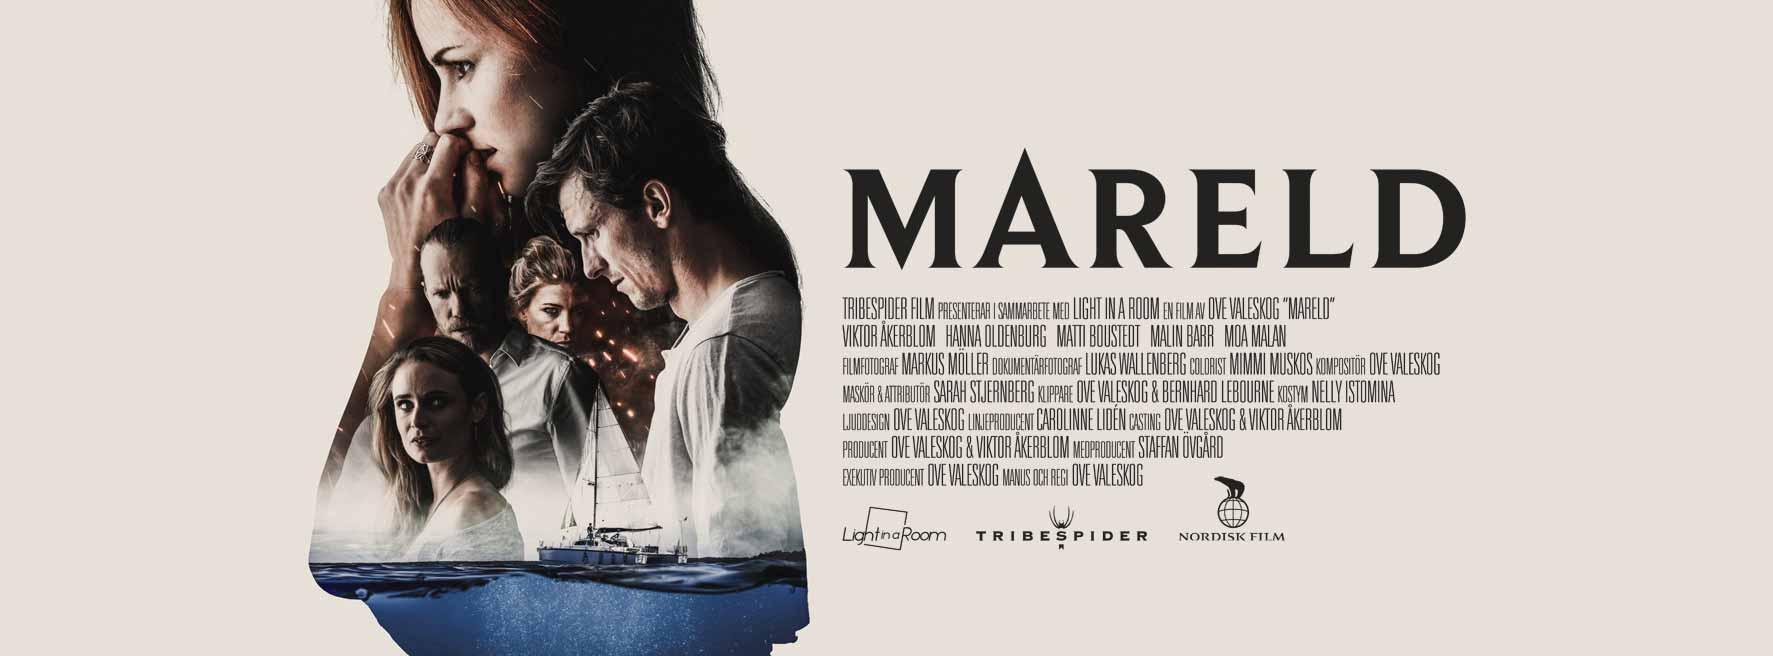 Mareld (2019) Movie Poster